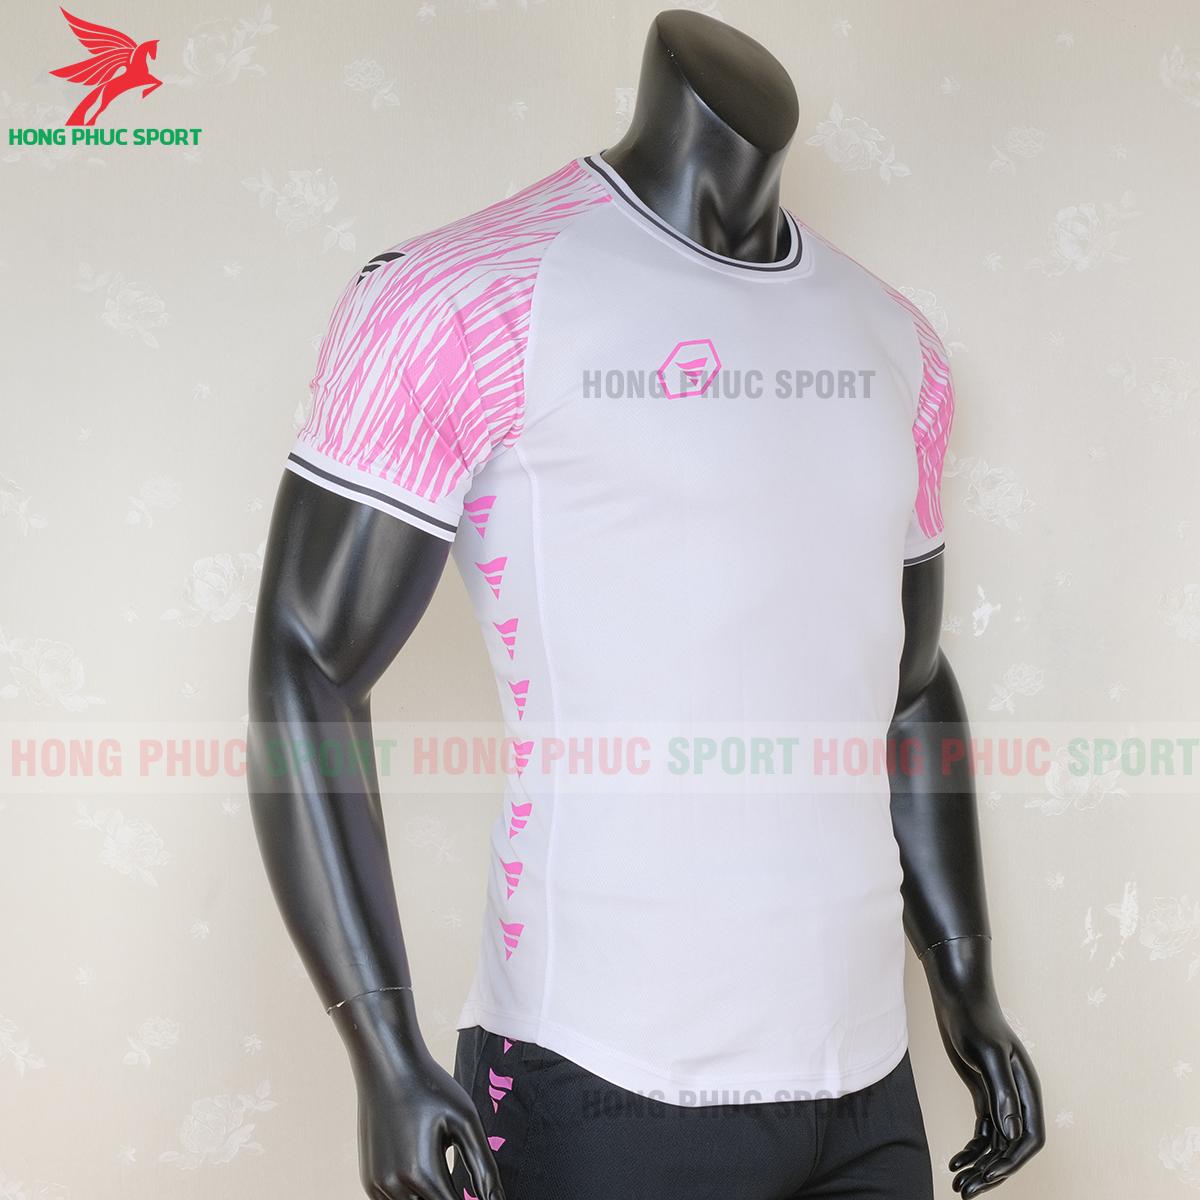 https://cdn.hongphucsport.com/unsafe/s4.shopbay.vn/files/285/ao-bong-da-khong-logo-ta-a06-mau-2-4-5f71c16a627c2.png